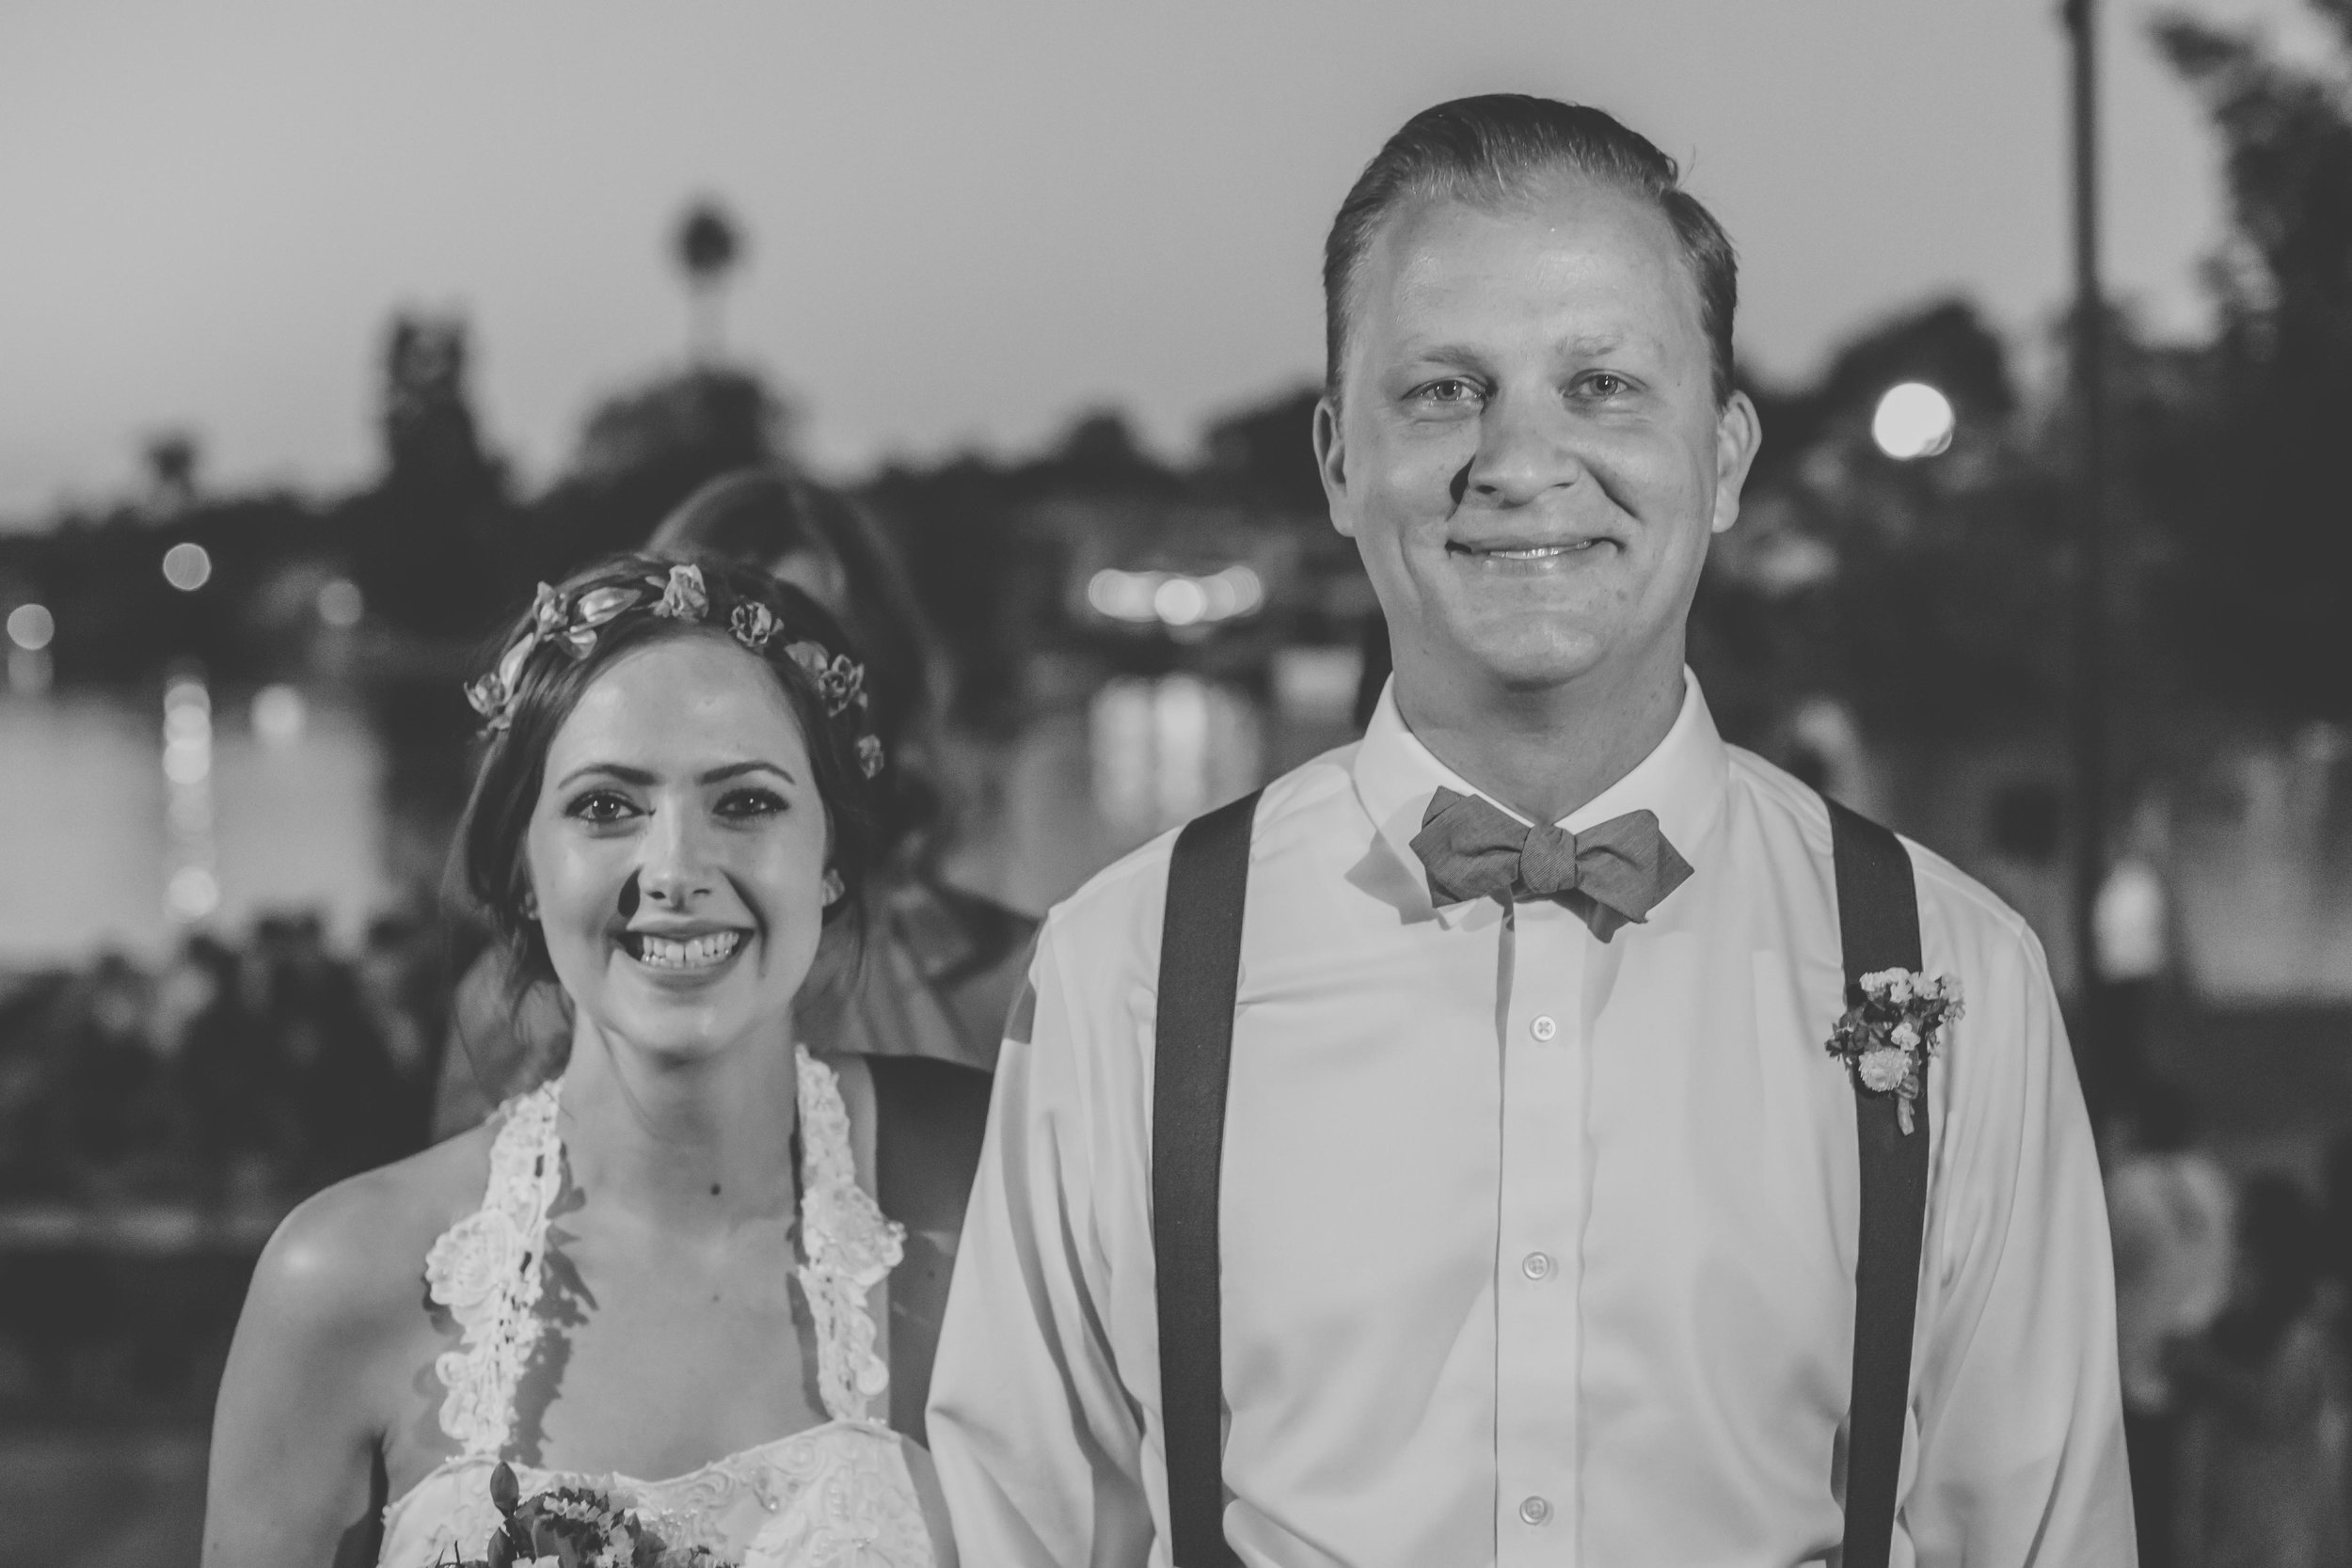 20141024-DePartee-Wedding-APavone-053-sm.jpg